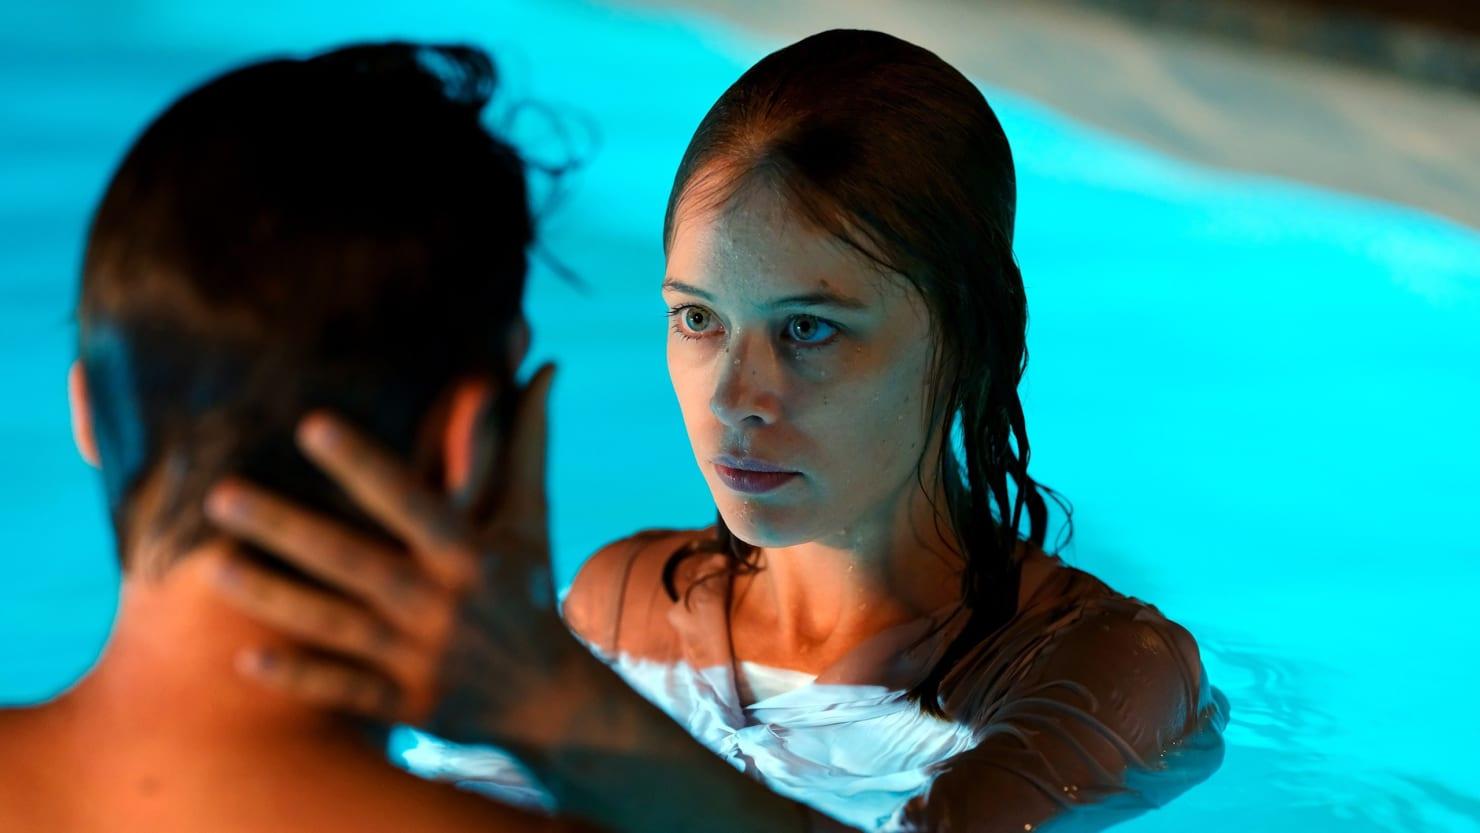 'Undine' Is a Mermaid Love Story Unlike Any You've Seen